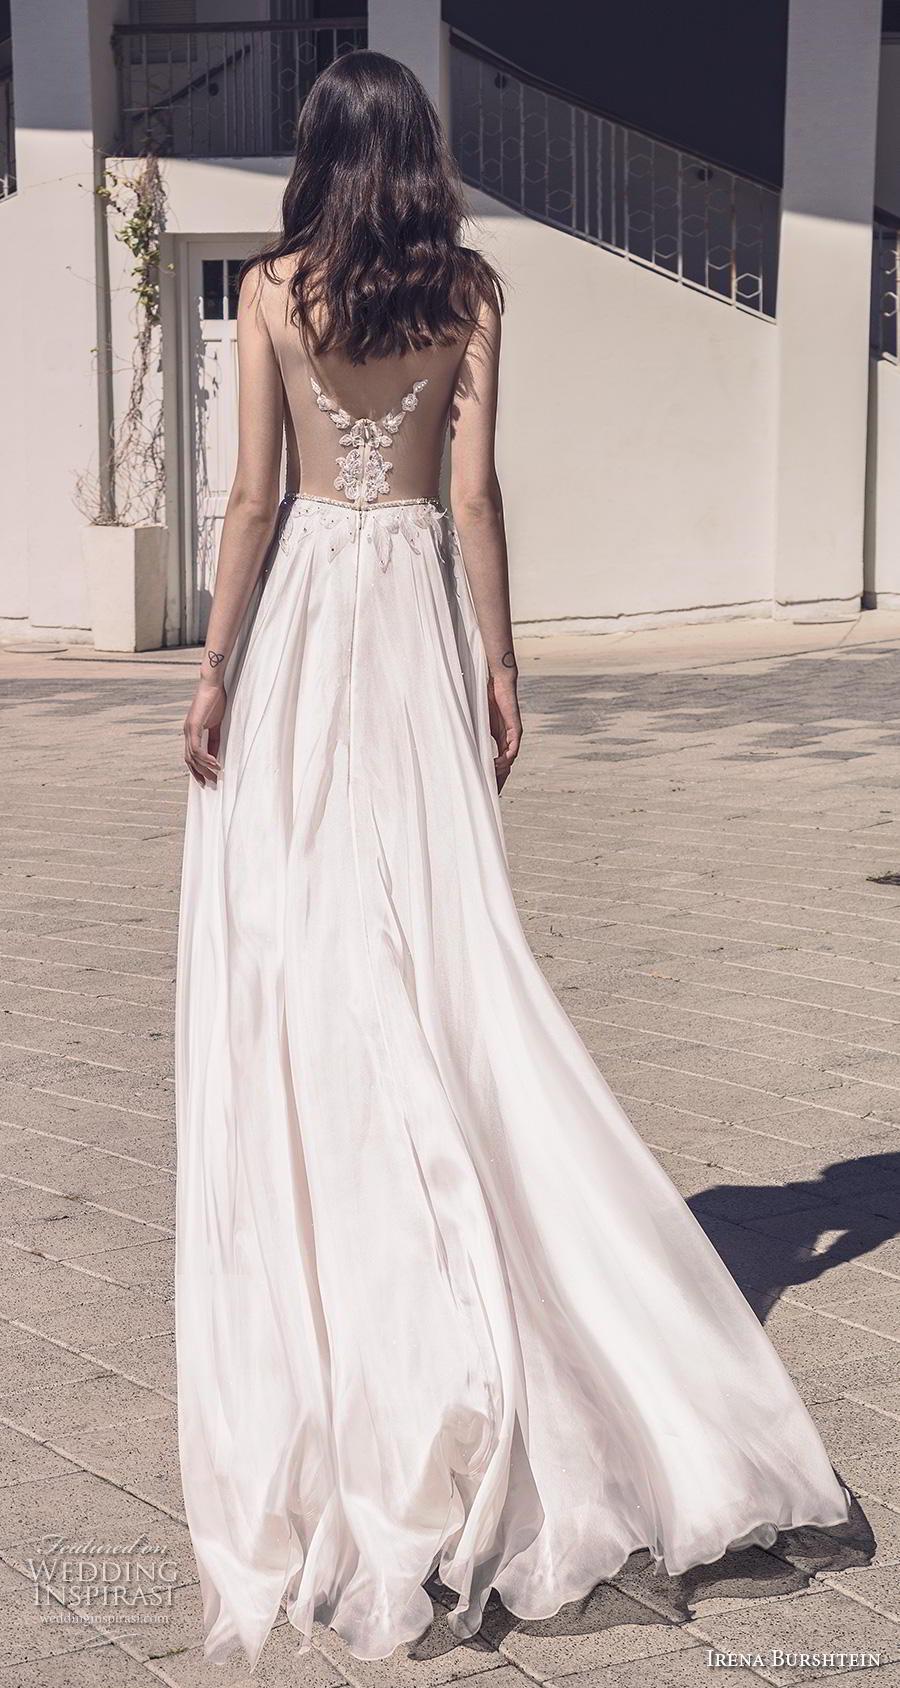 irena burshtein 2020 bridal sleeveless thin strap deep sweetheart neckline heavily embellished bodice romantic soft a  line wedding dress v back chapel train (6) bv